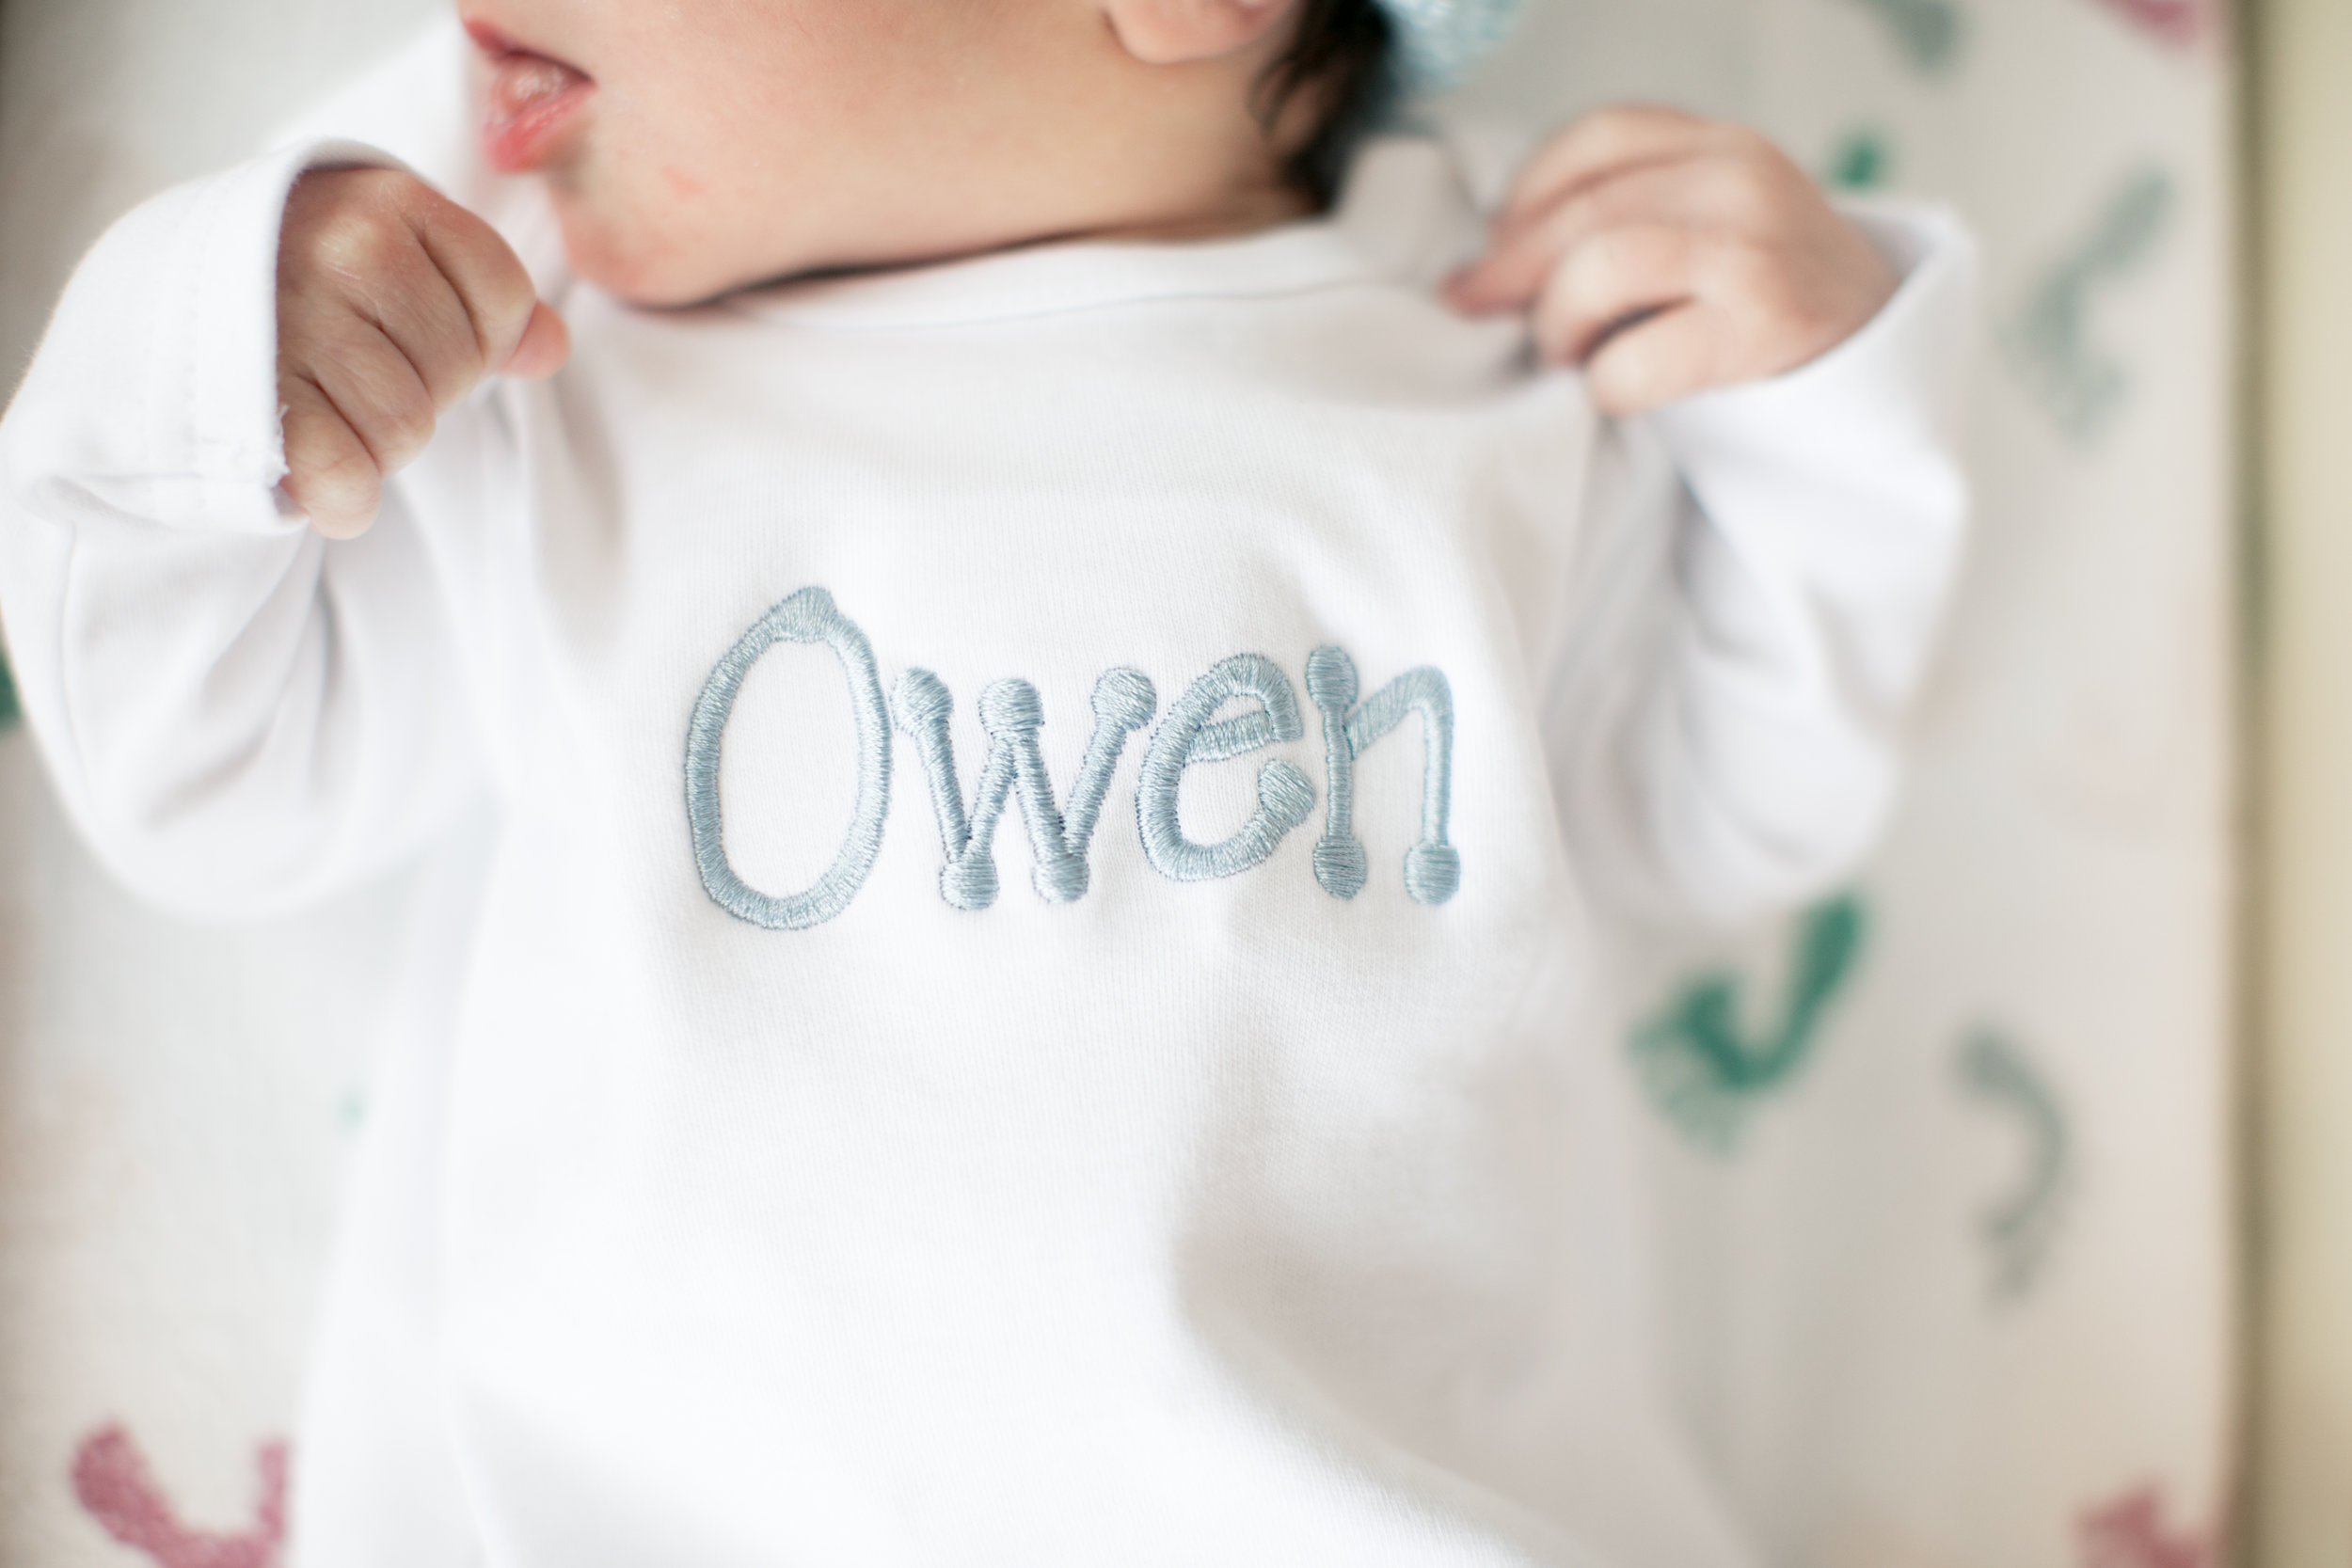 OwenFresh48-98.jpg